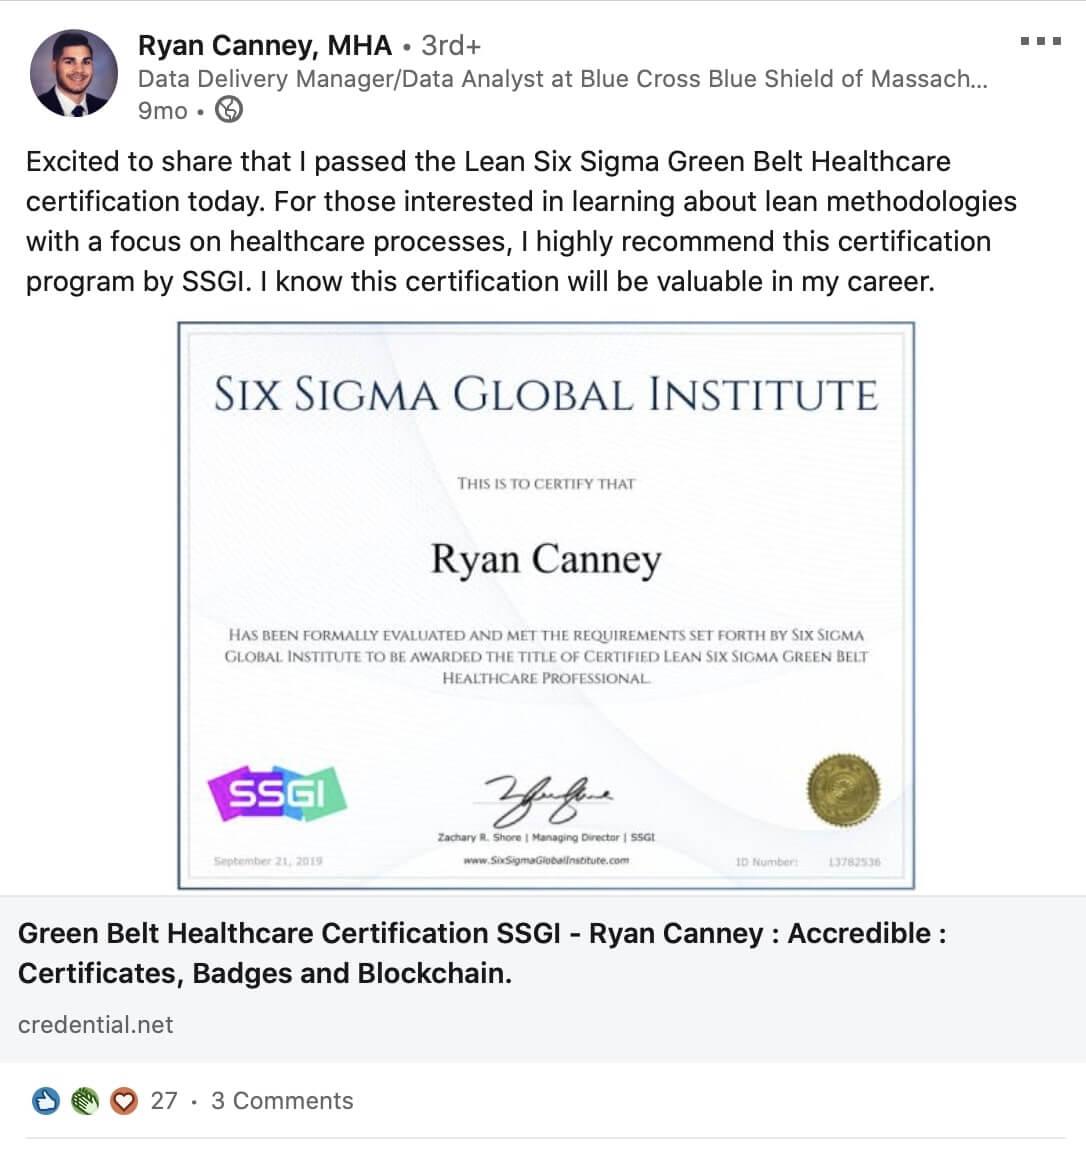 ssgi lean six sigma green belt healthcare review